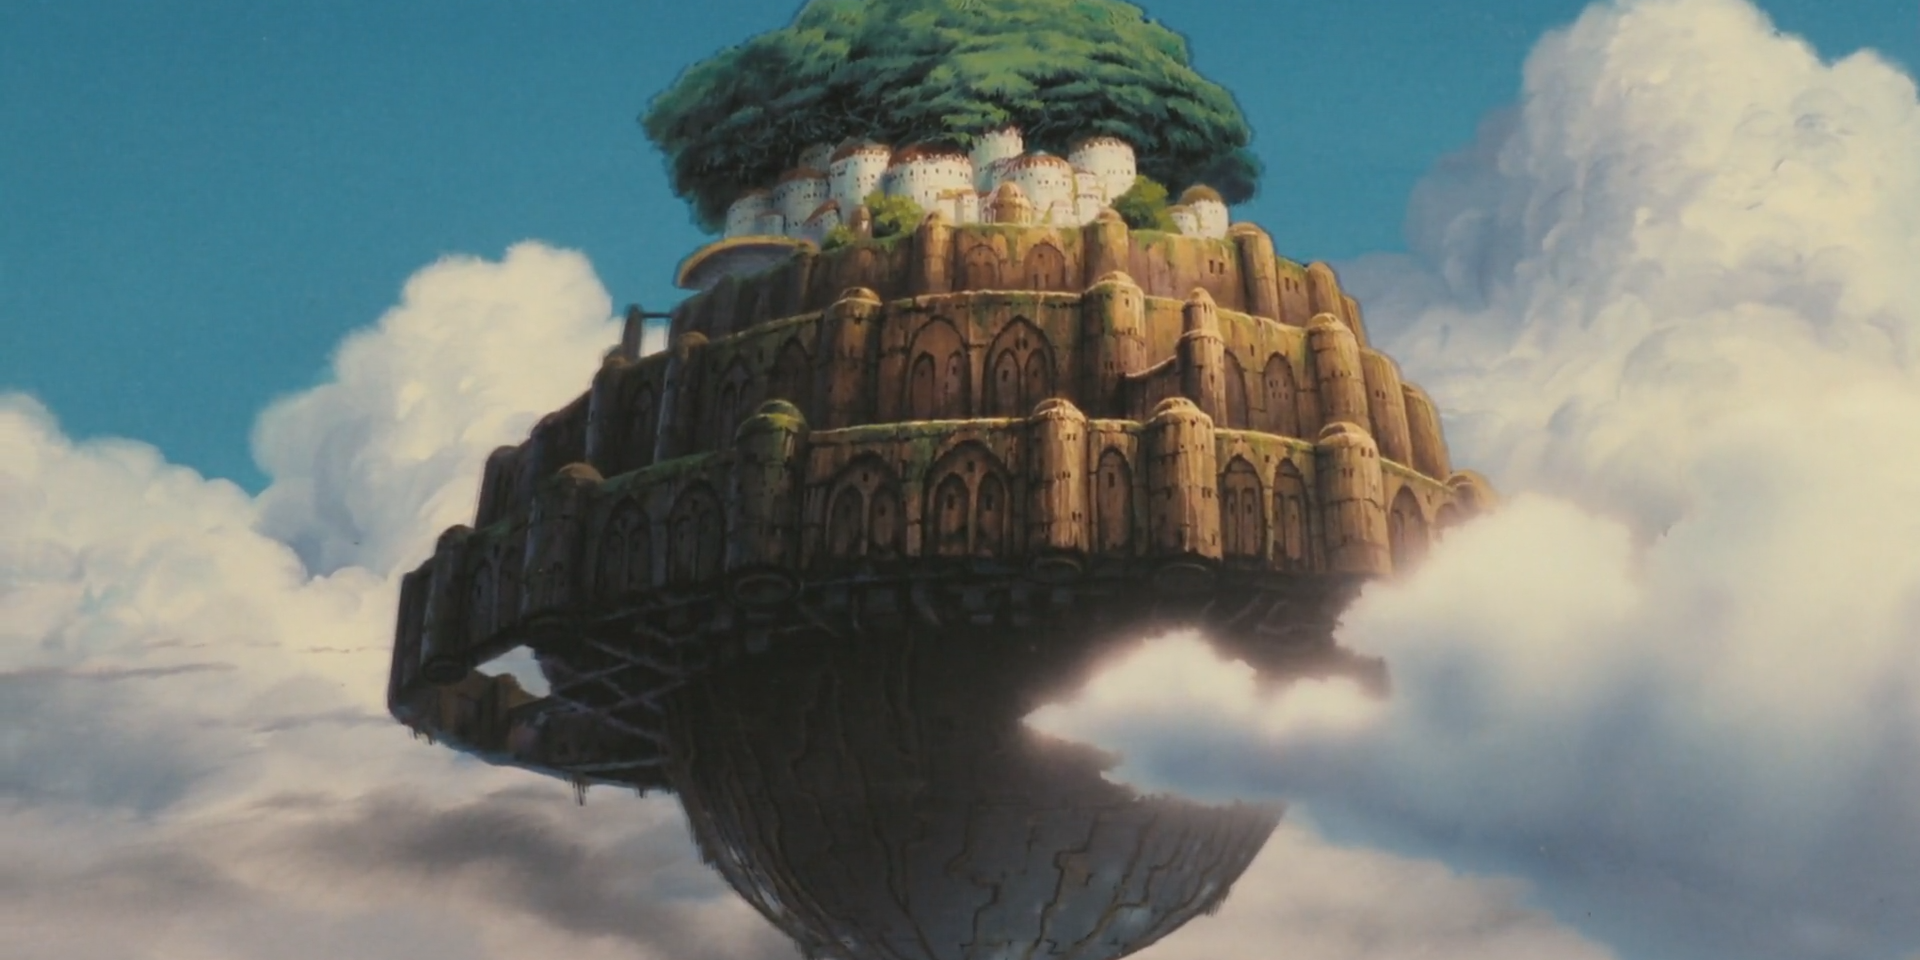 Peel the Onion|Entering the World of Studio Ghibli